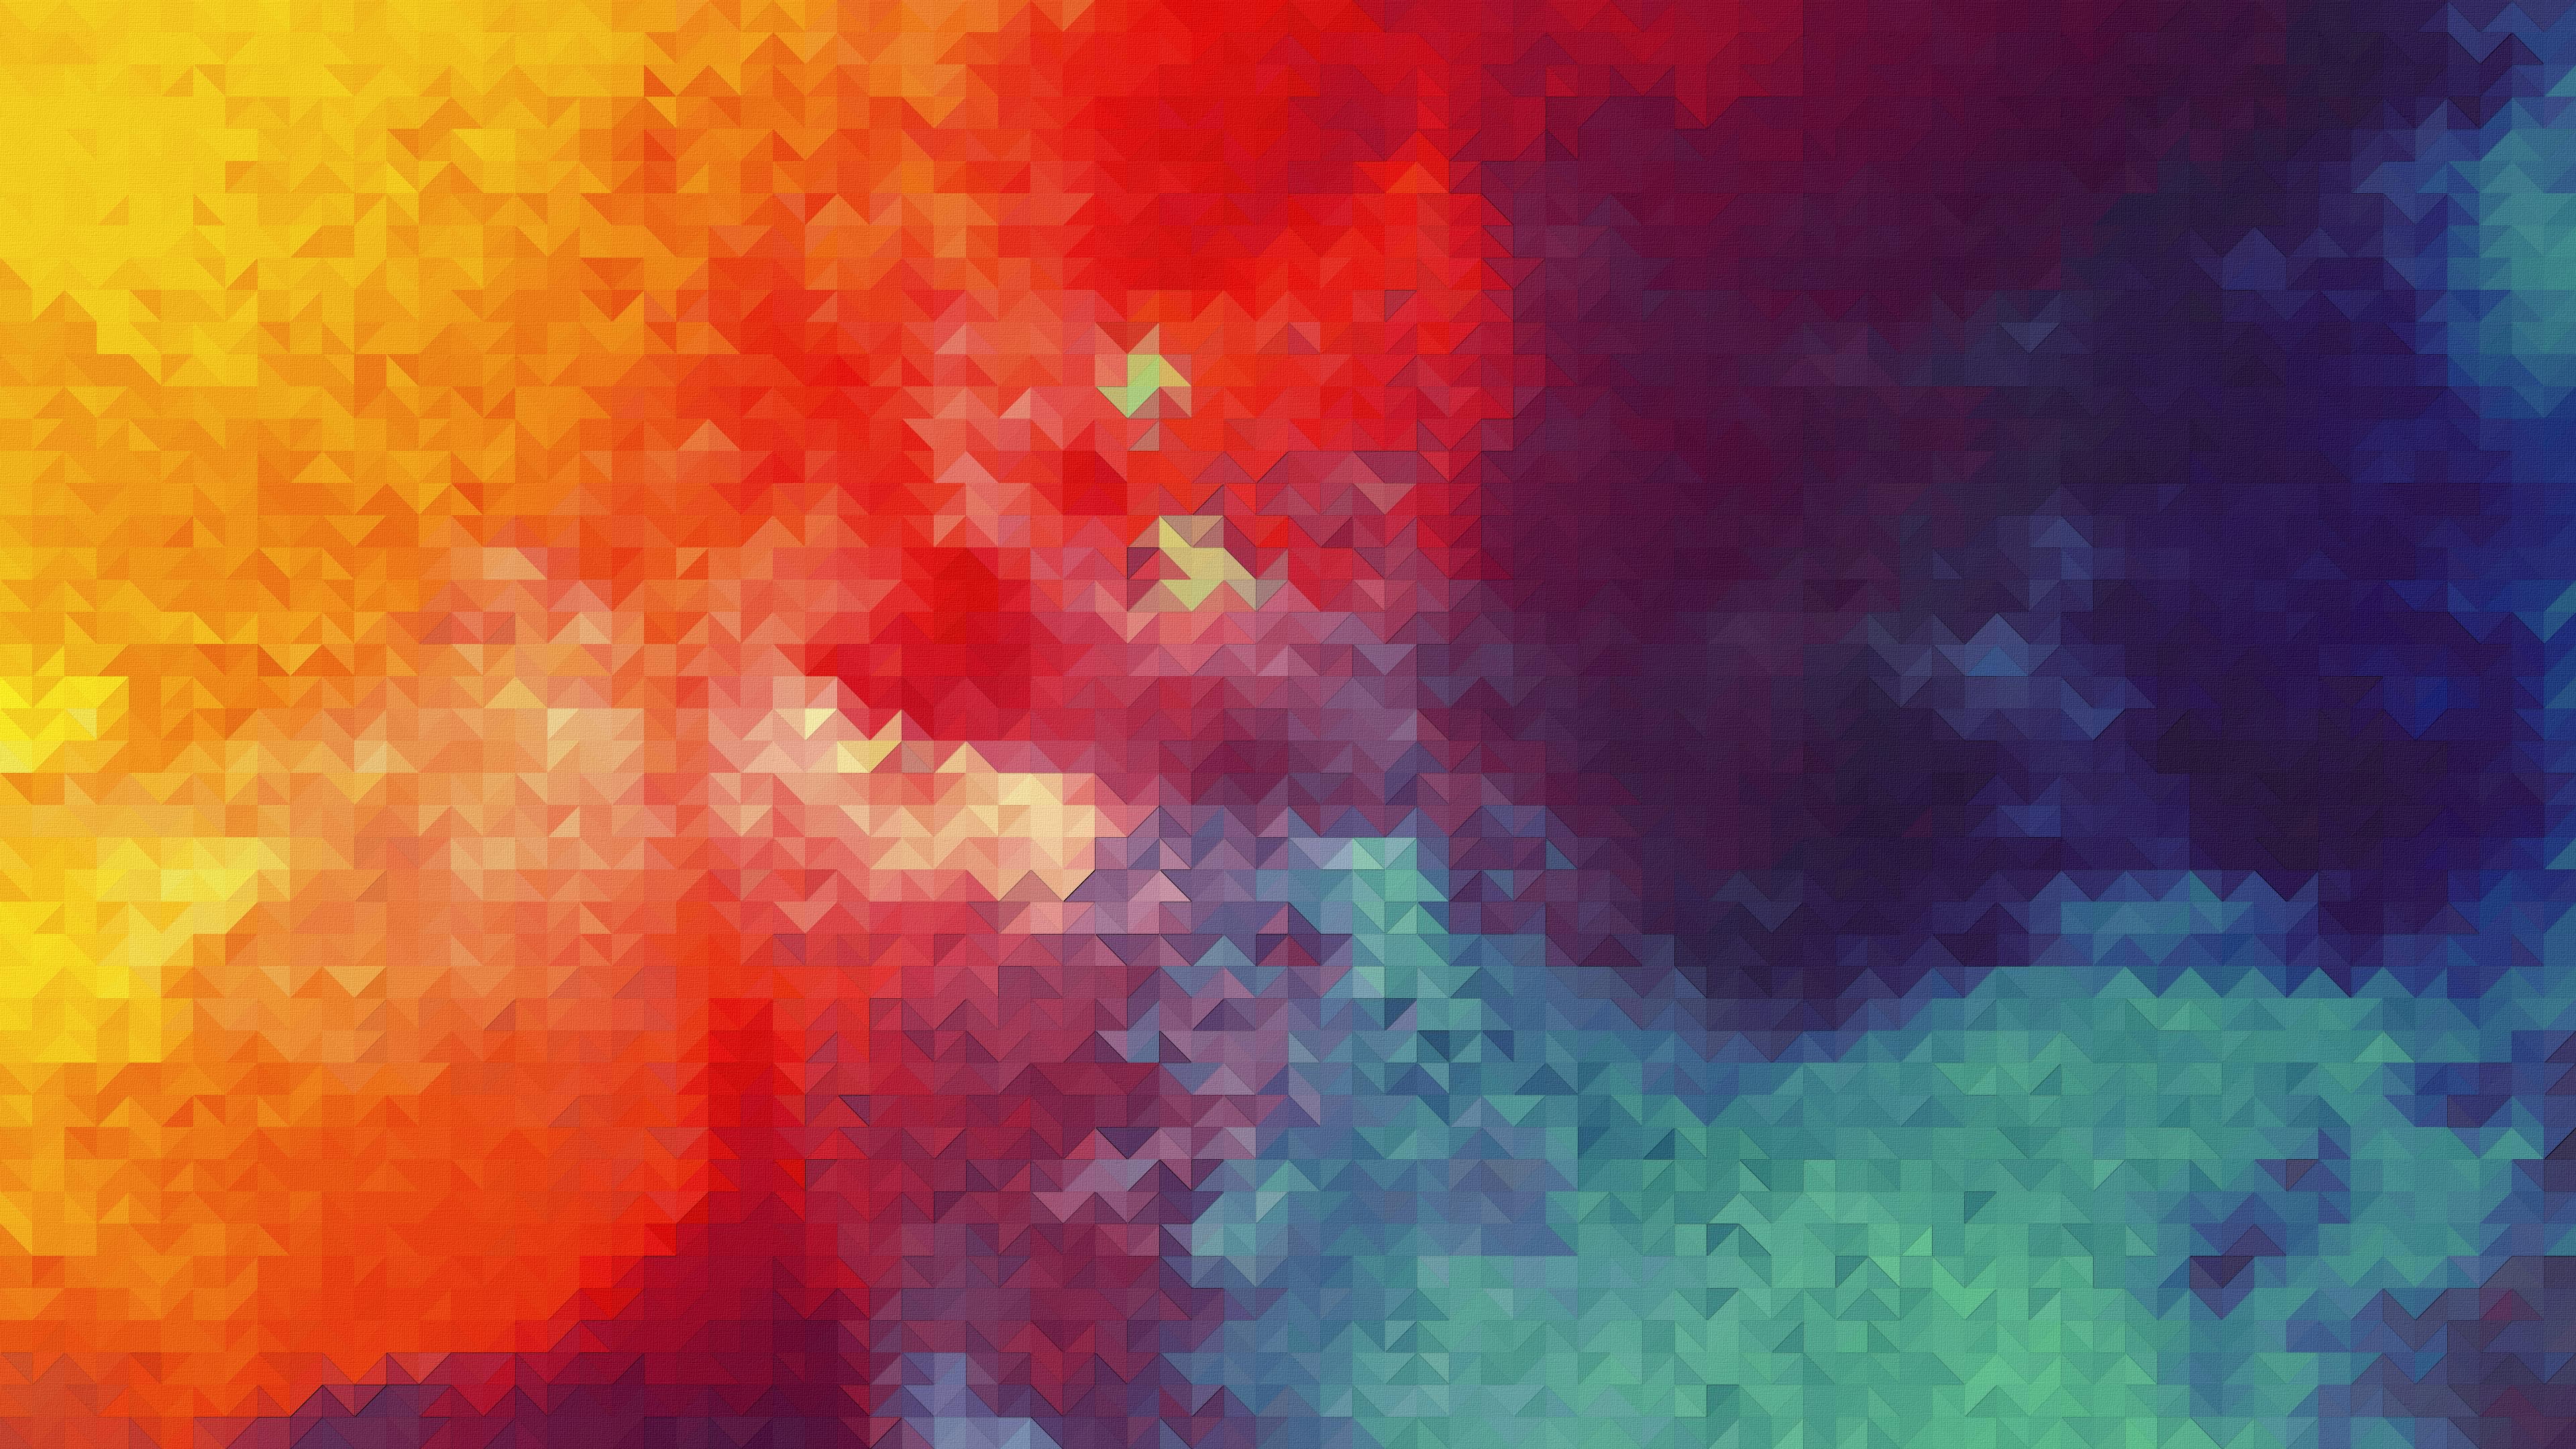 97 974462 digital painting background 4k